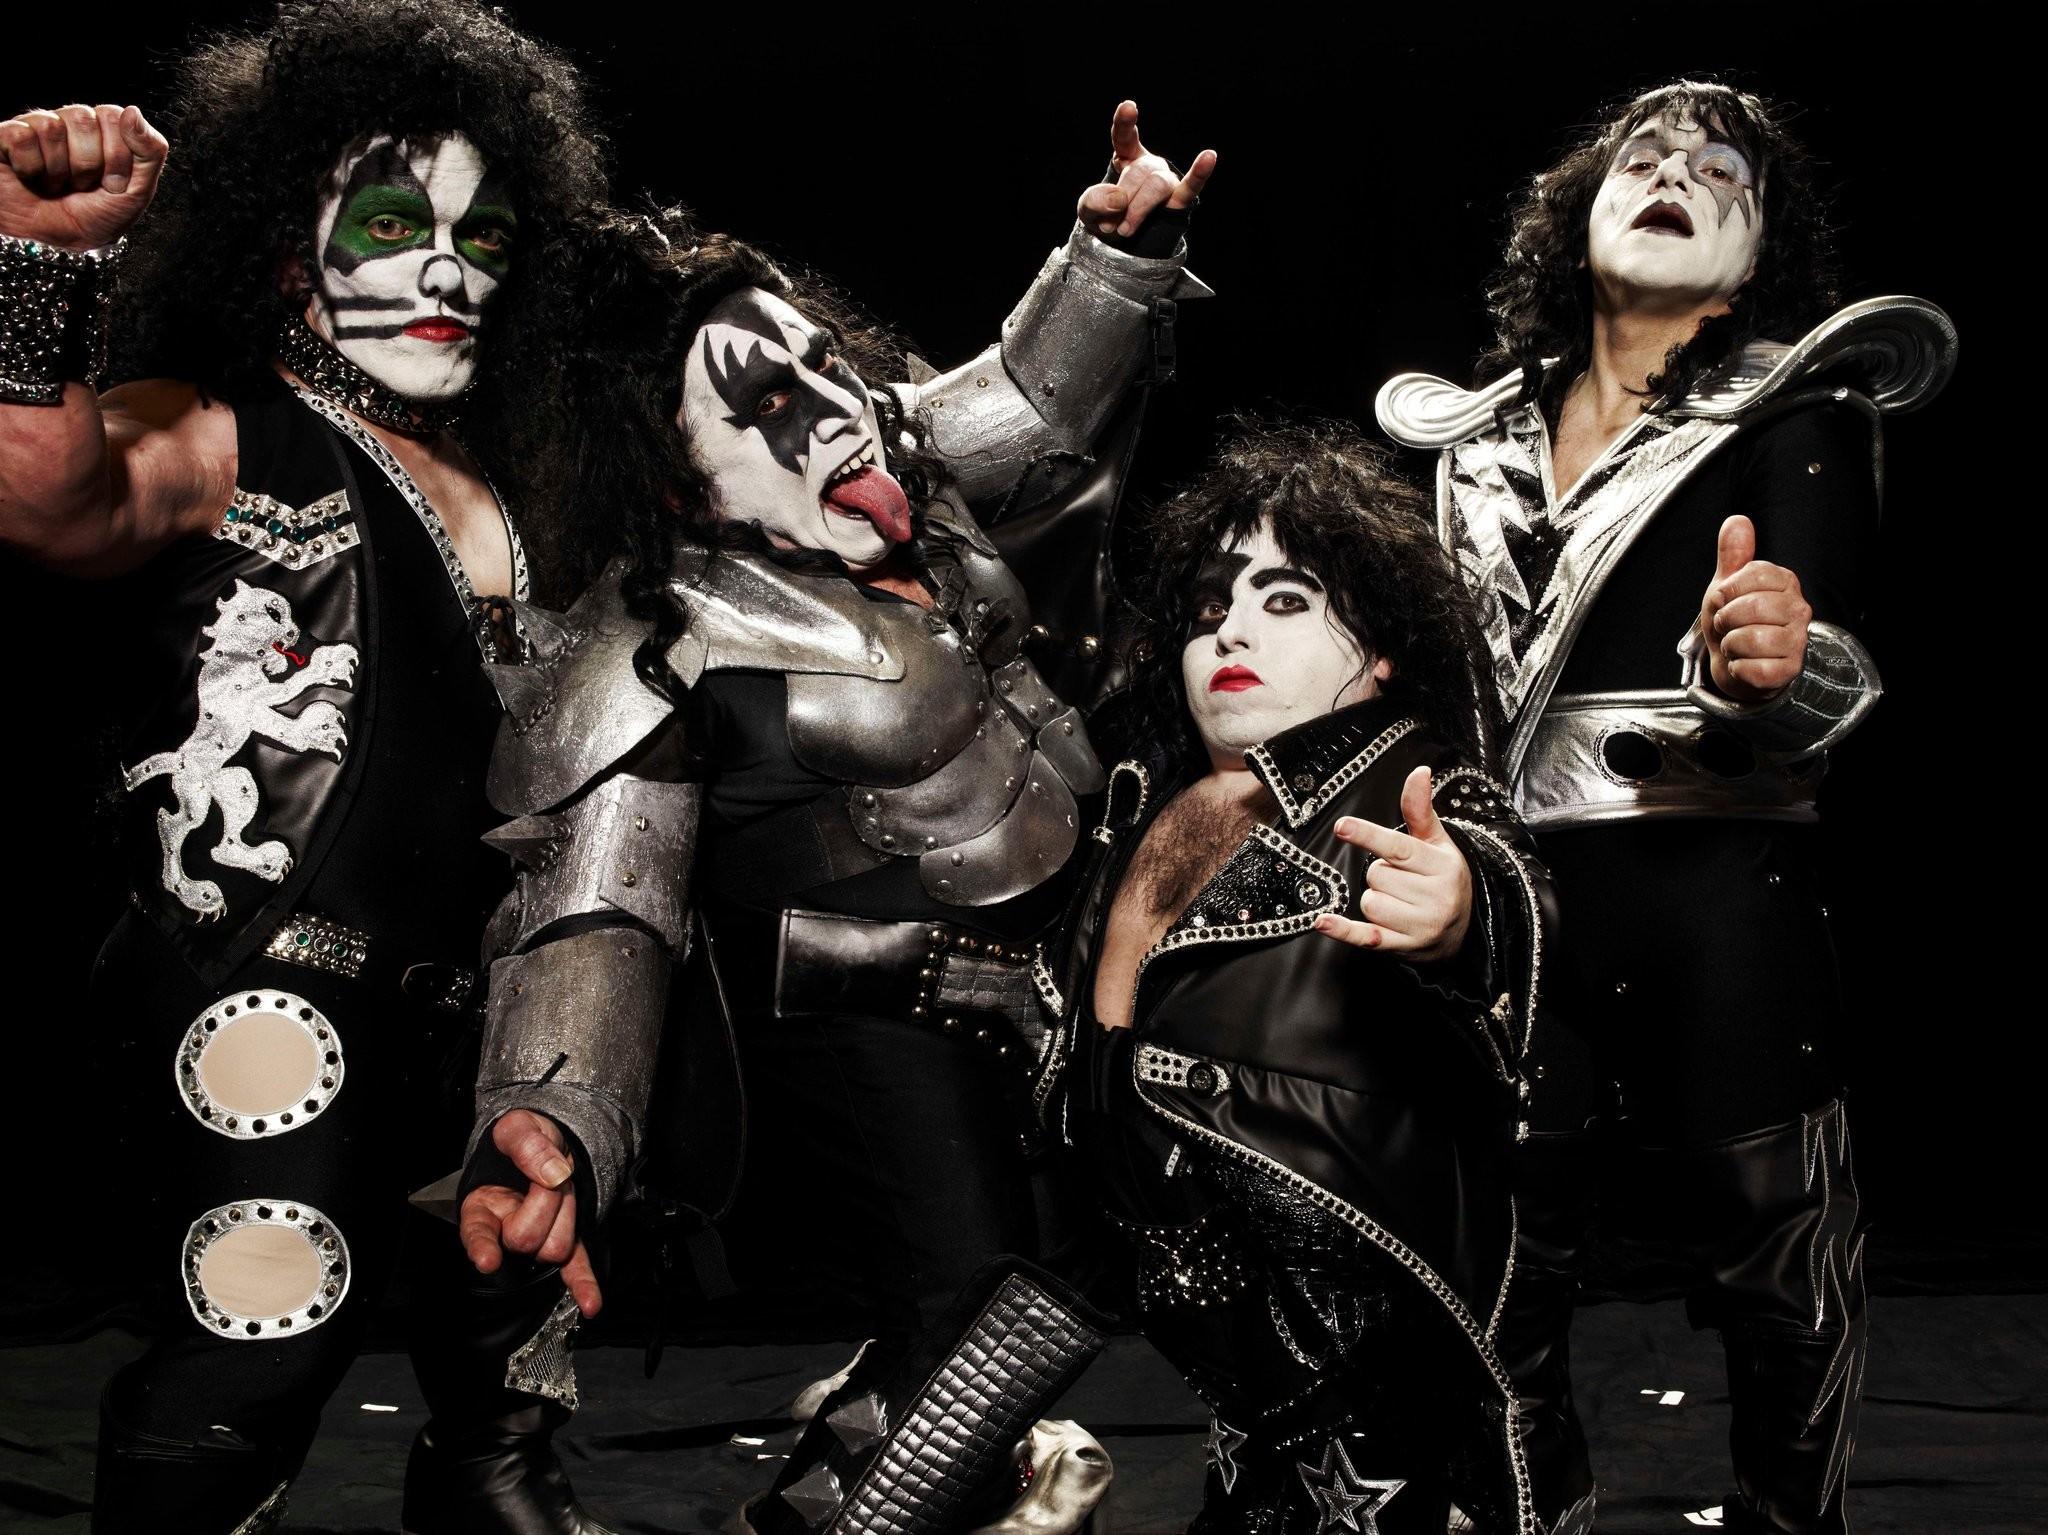 Kiss wallpaper, heavy metal rock bands humor | Wallpaper